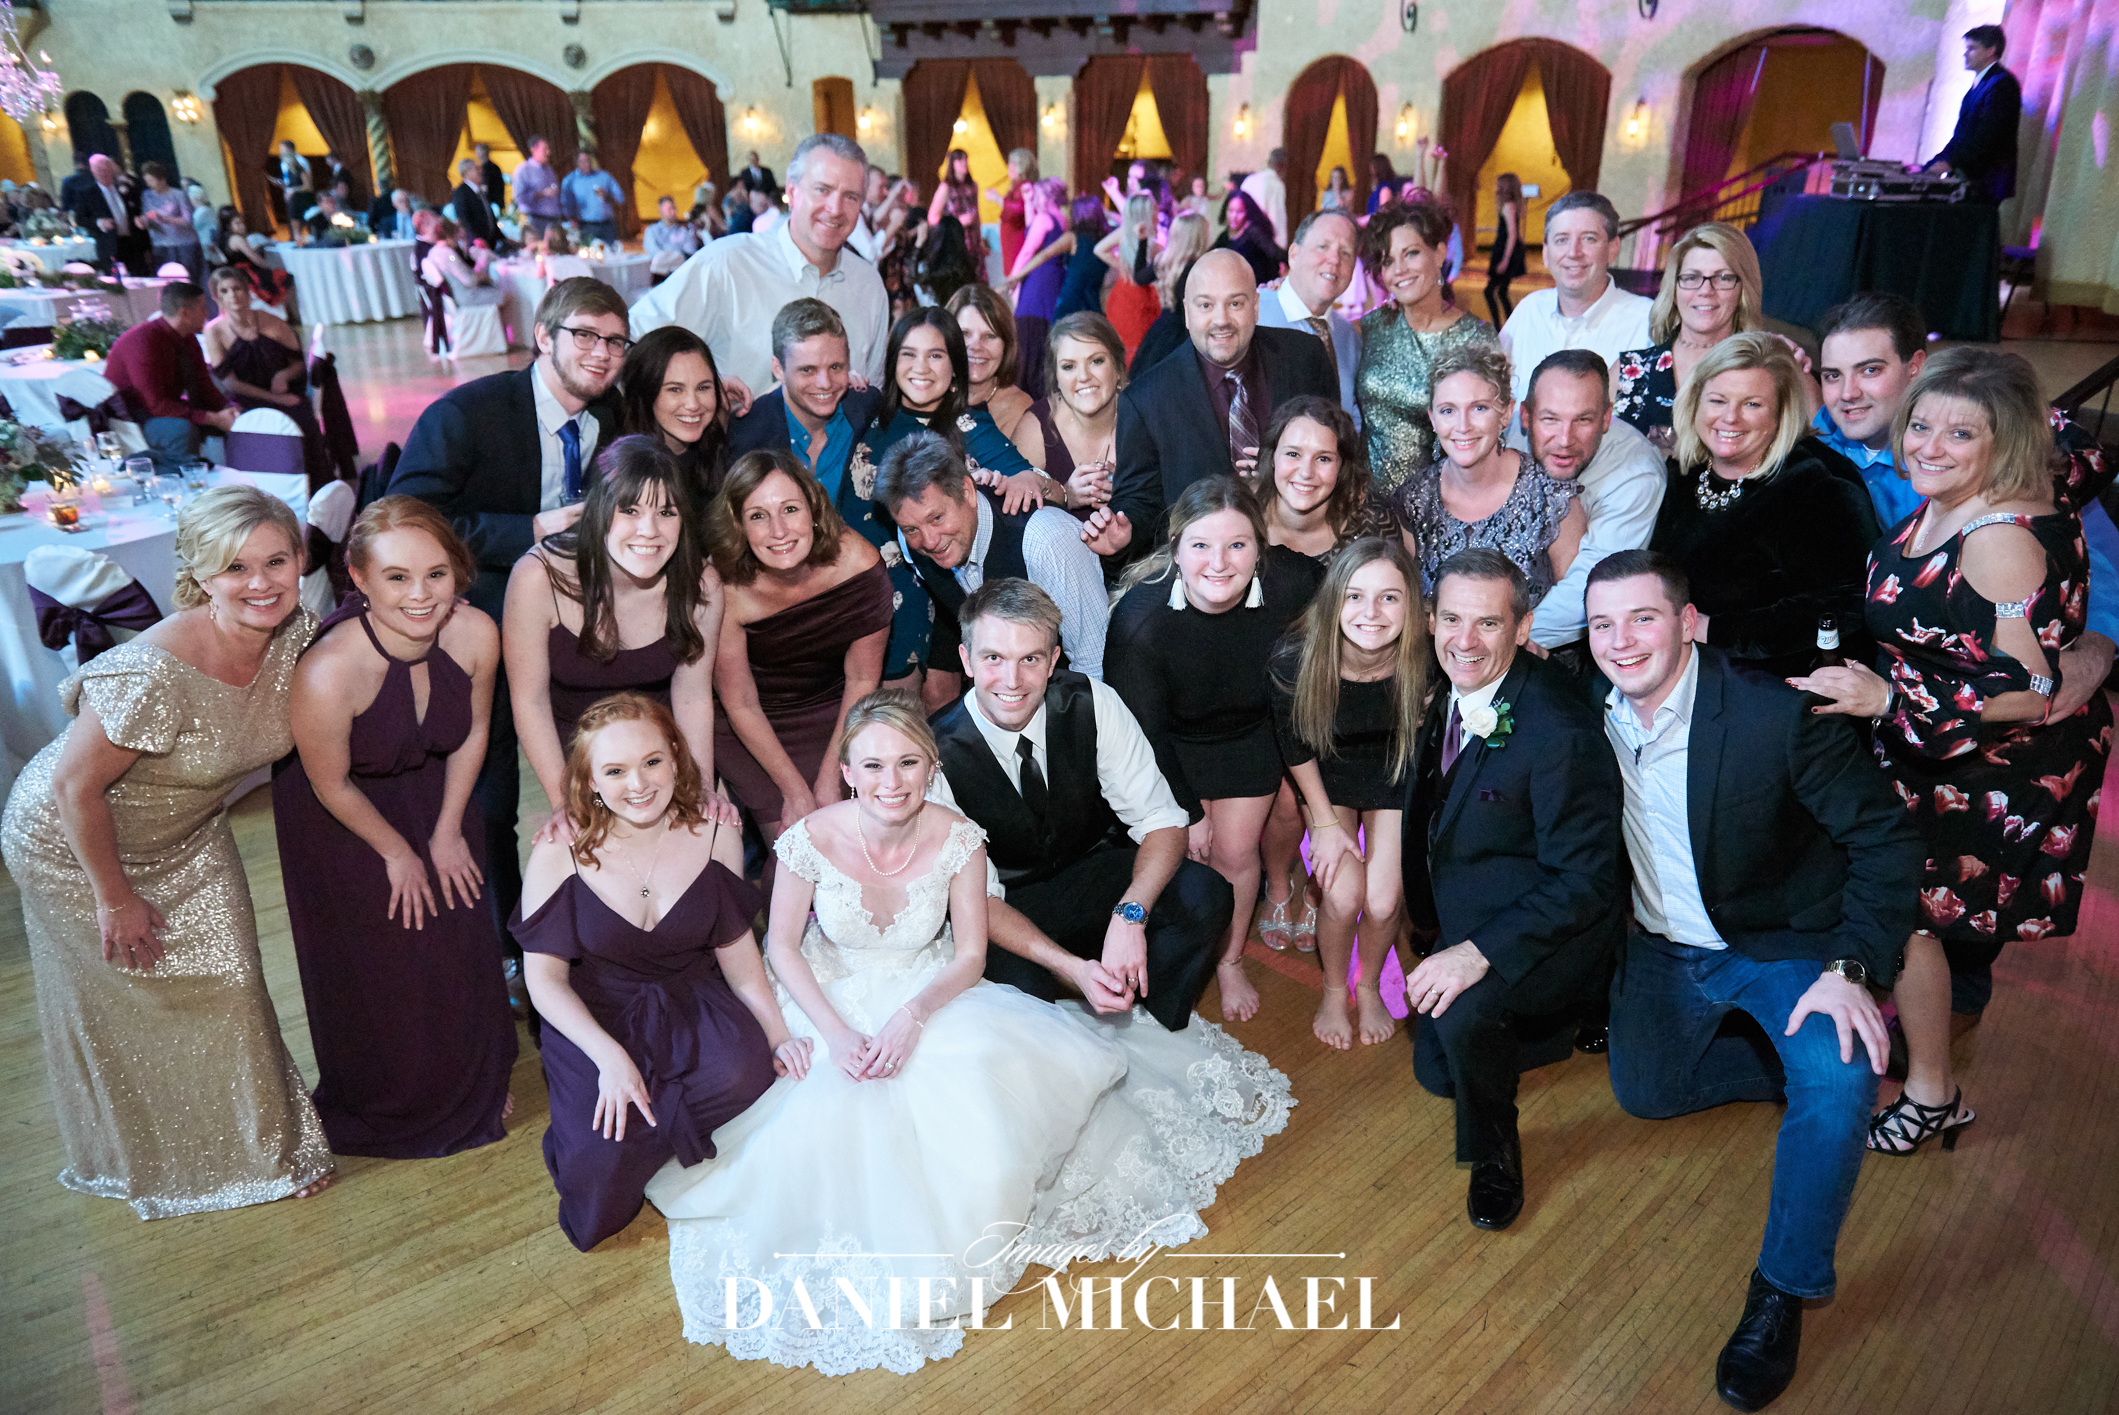 Indiana Rooftop Ballroom Venue Indianapolis Wedding Photographer Reception